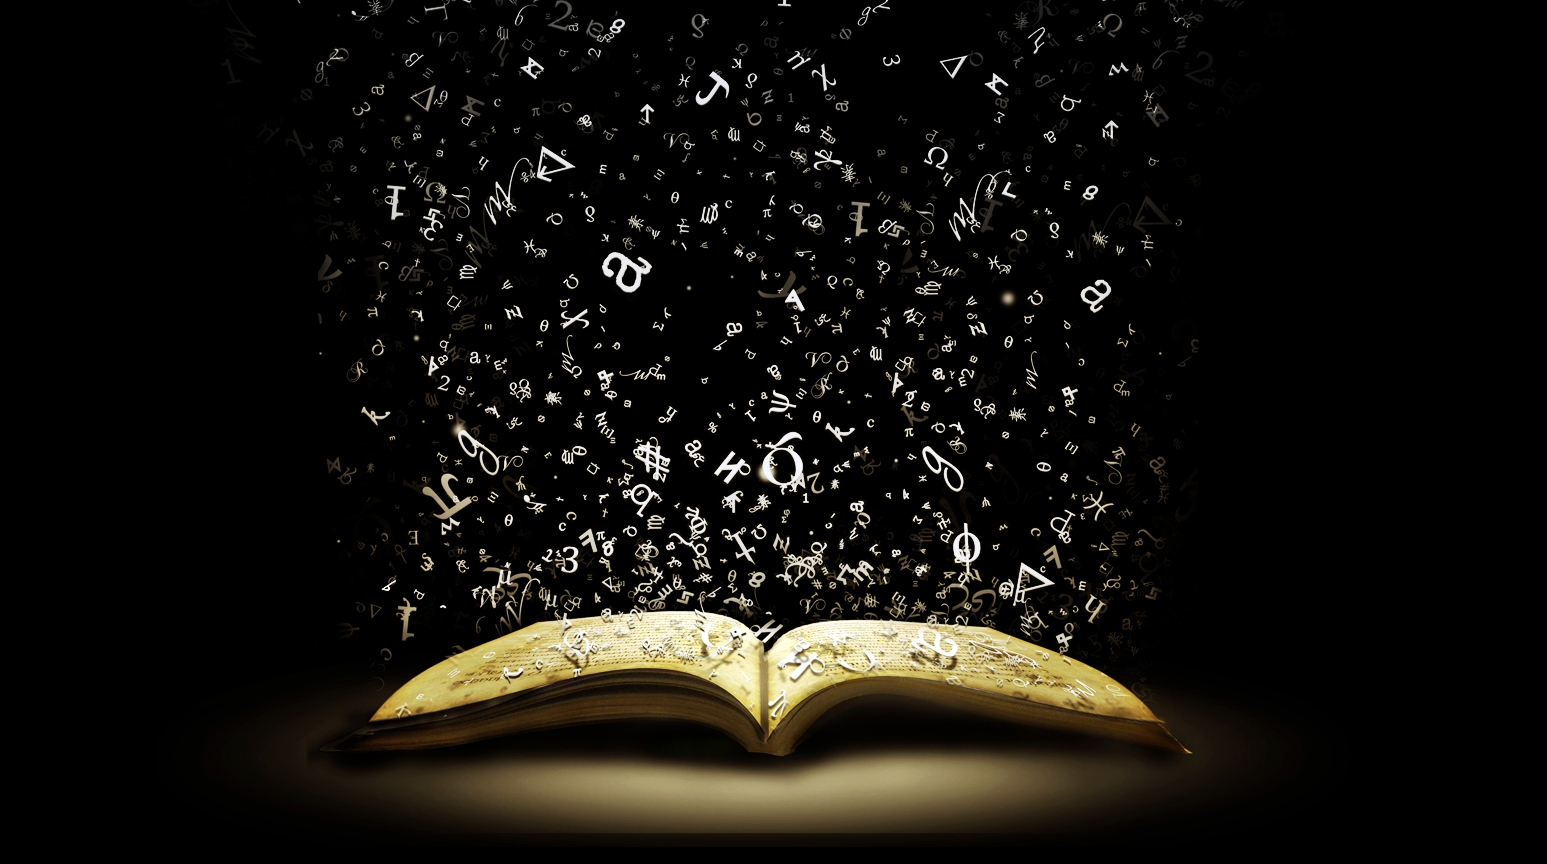 foto: malemudrosti.com